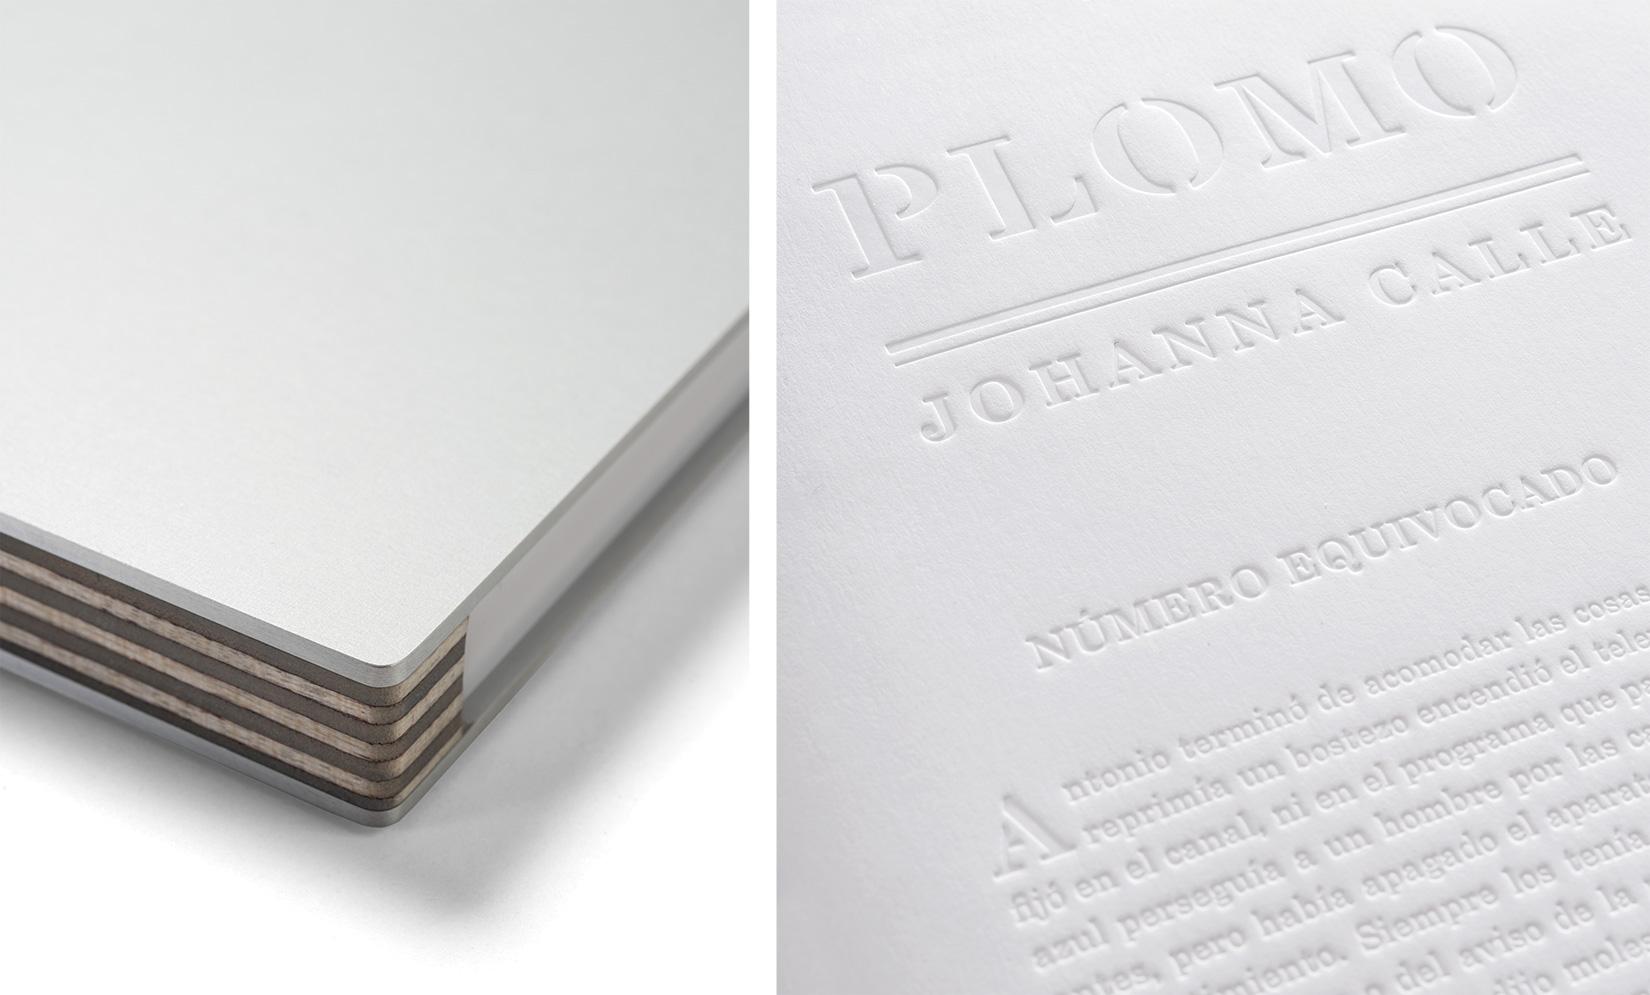 johanna-calle-olivier-andreotti-toluca-editions-06.jpg